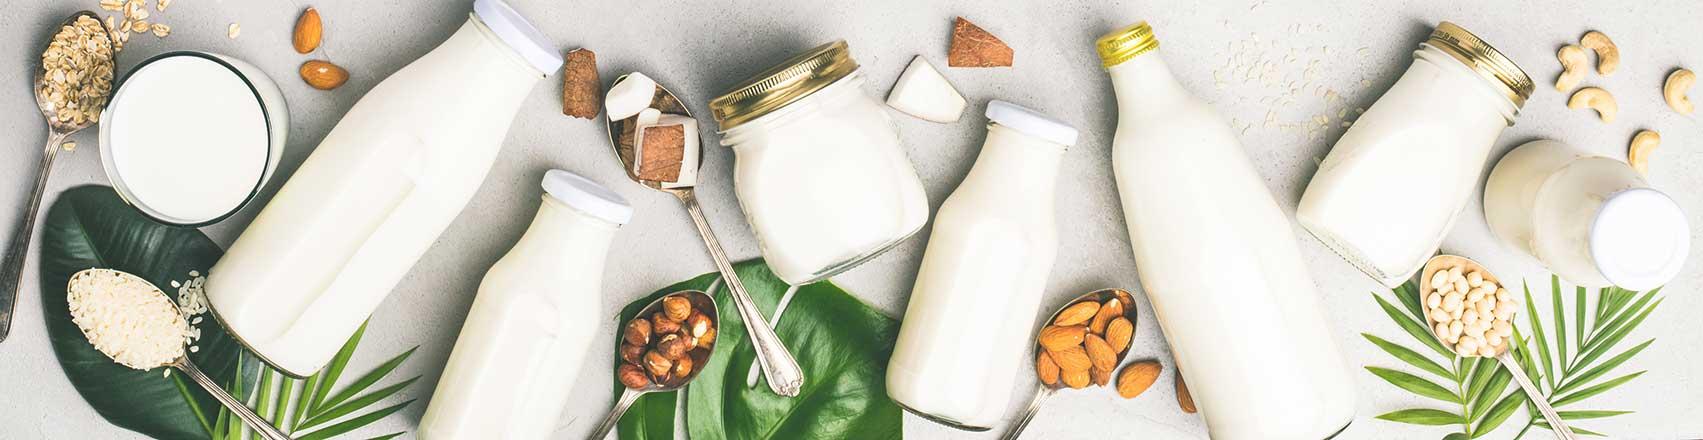 Plant-Based Sources of Calcium